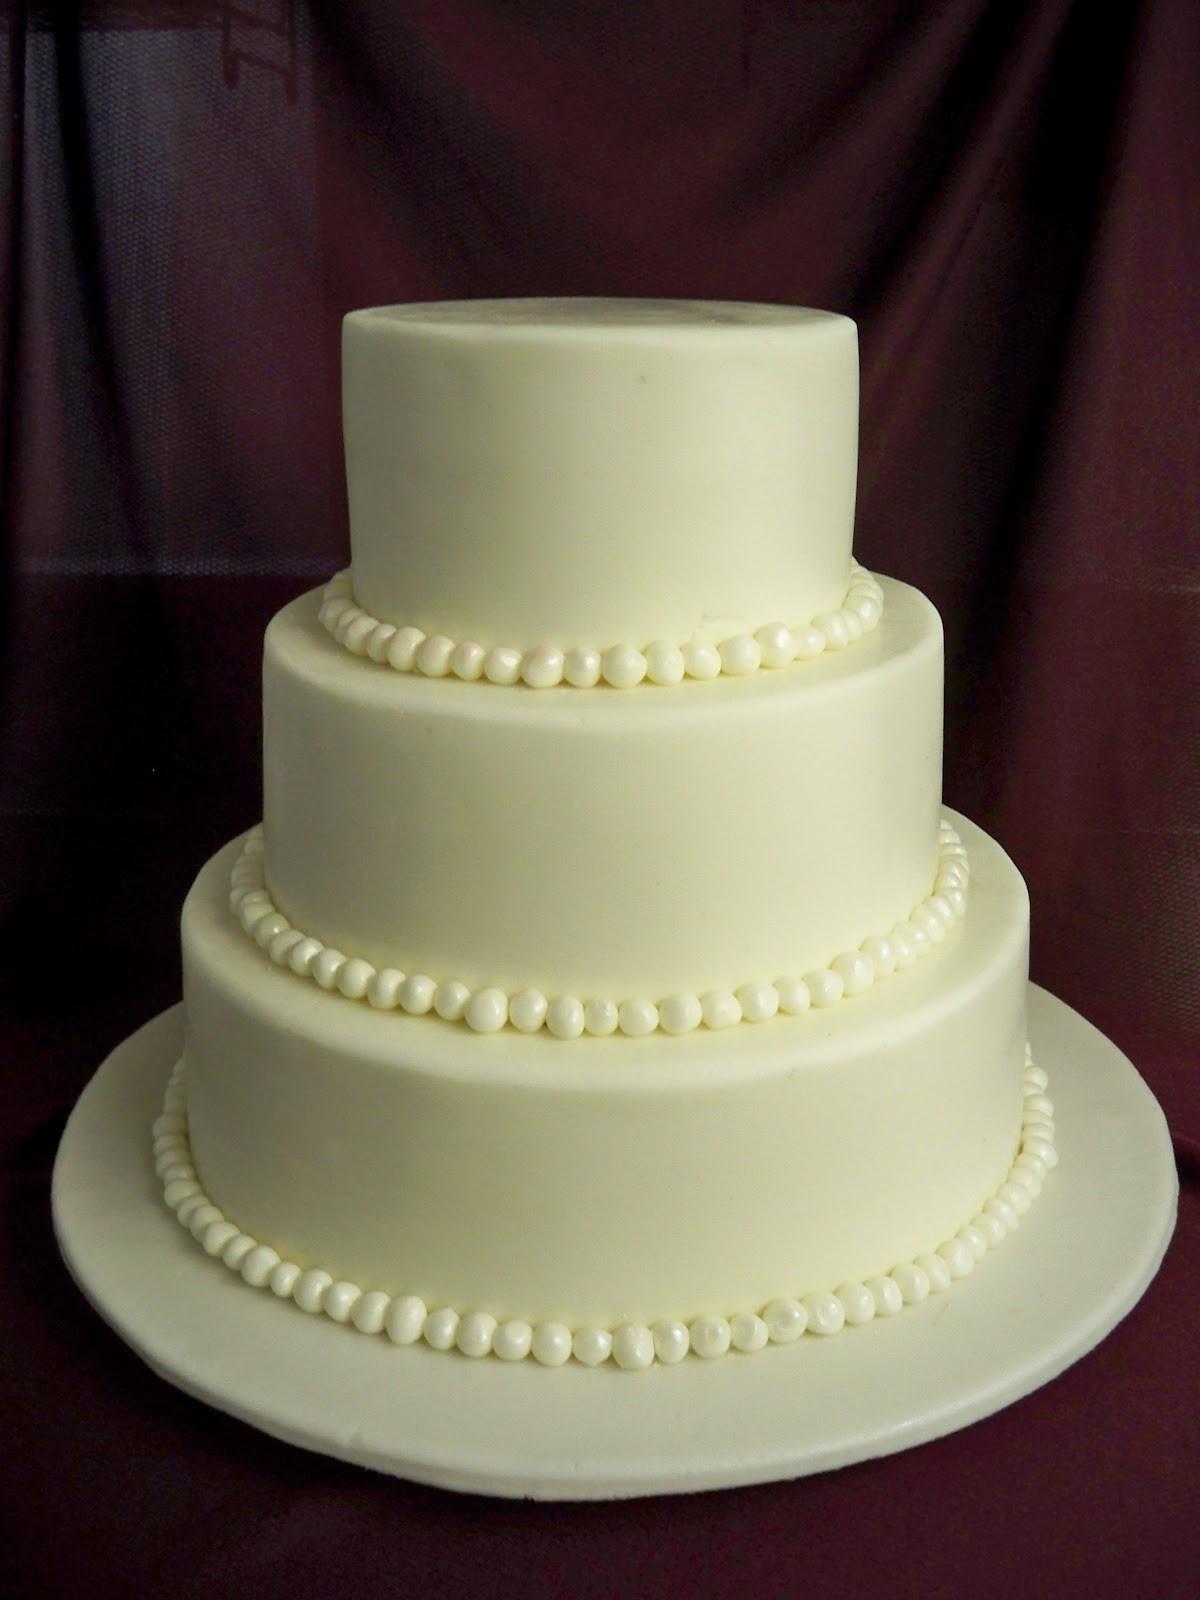 Wedding Cakes Three Tier  Price for 3 tier wedding cake idea in 2017